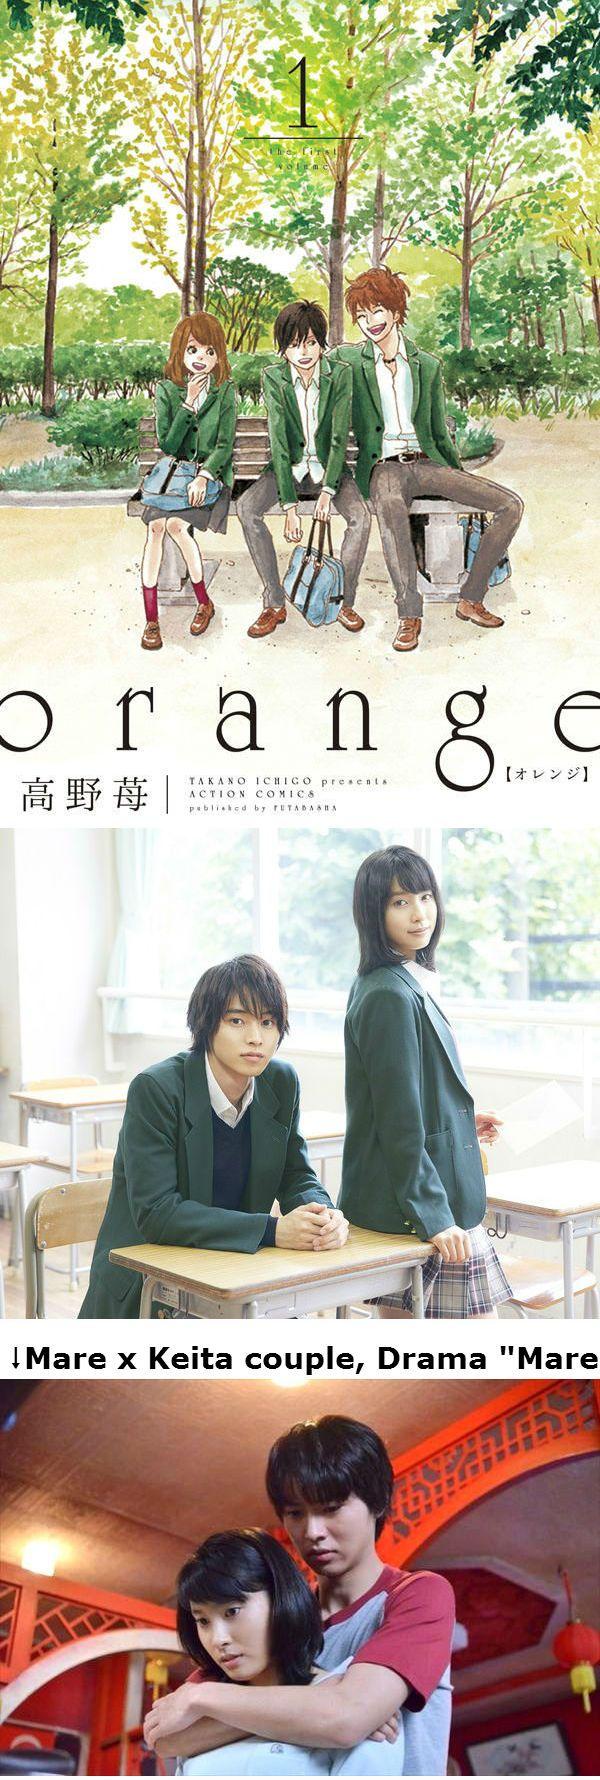 Kento Yamazaki x Tao Tsuchiya'll act together again in J live-action movie of…